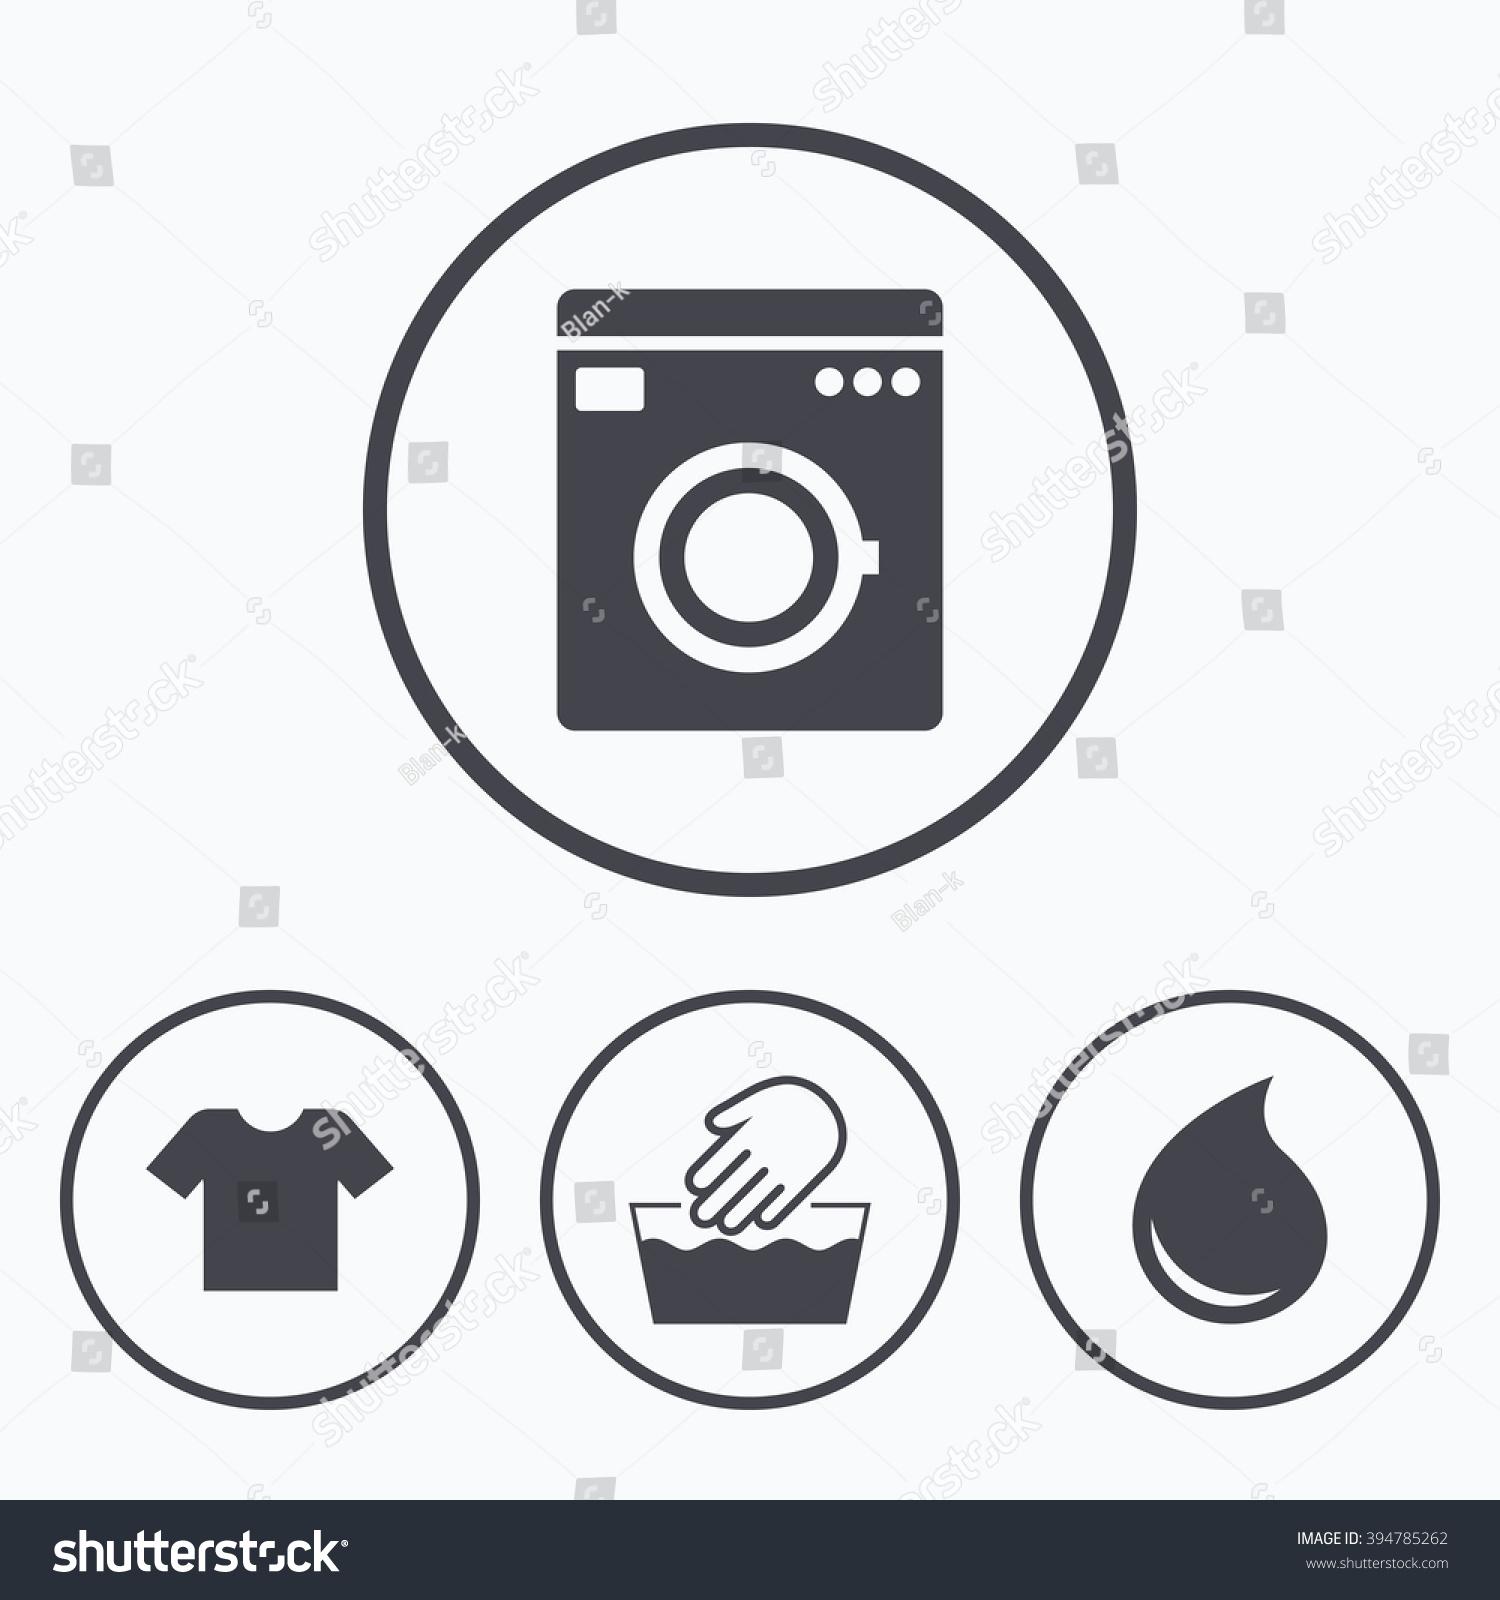 Wash machine icon hand wash tshirt stock vector 394785262 shutterstock wash machine icon hand wash t shirt clothes symbol laundry washhouse and buycottarizona Image collections